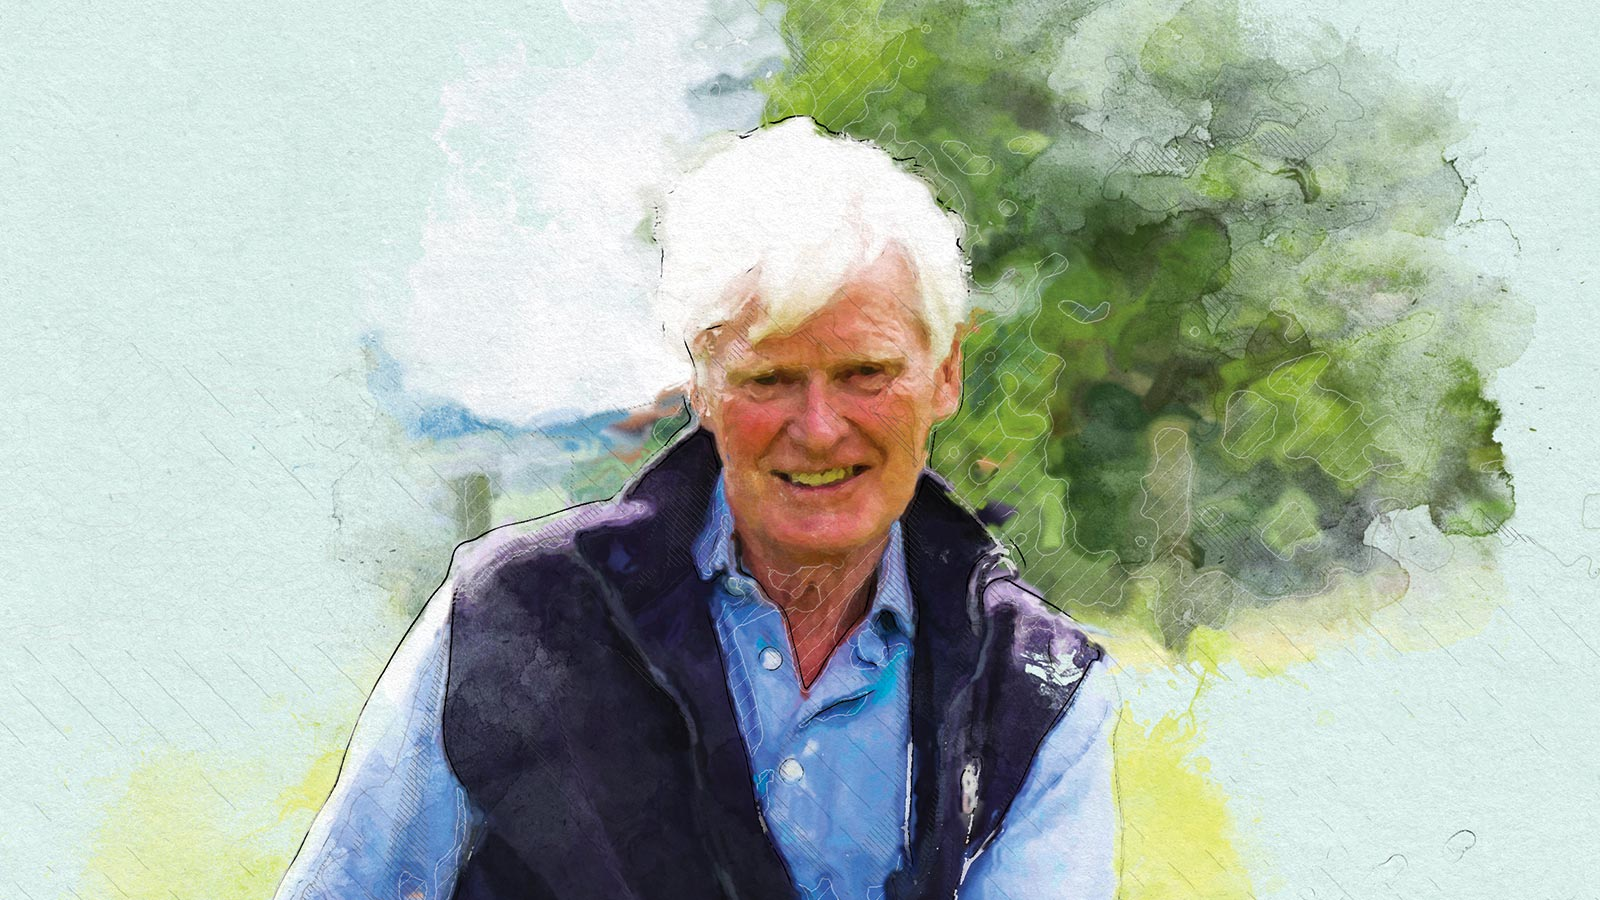 Lord Robert Newborough